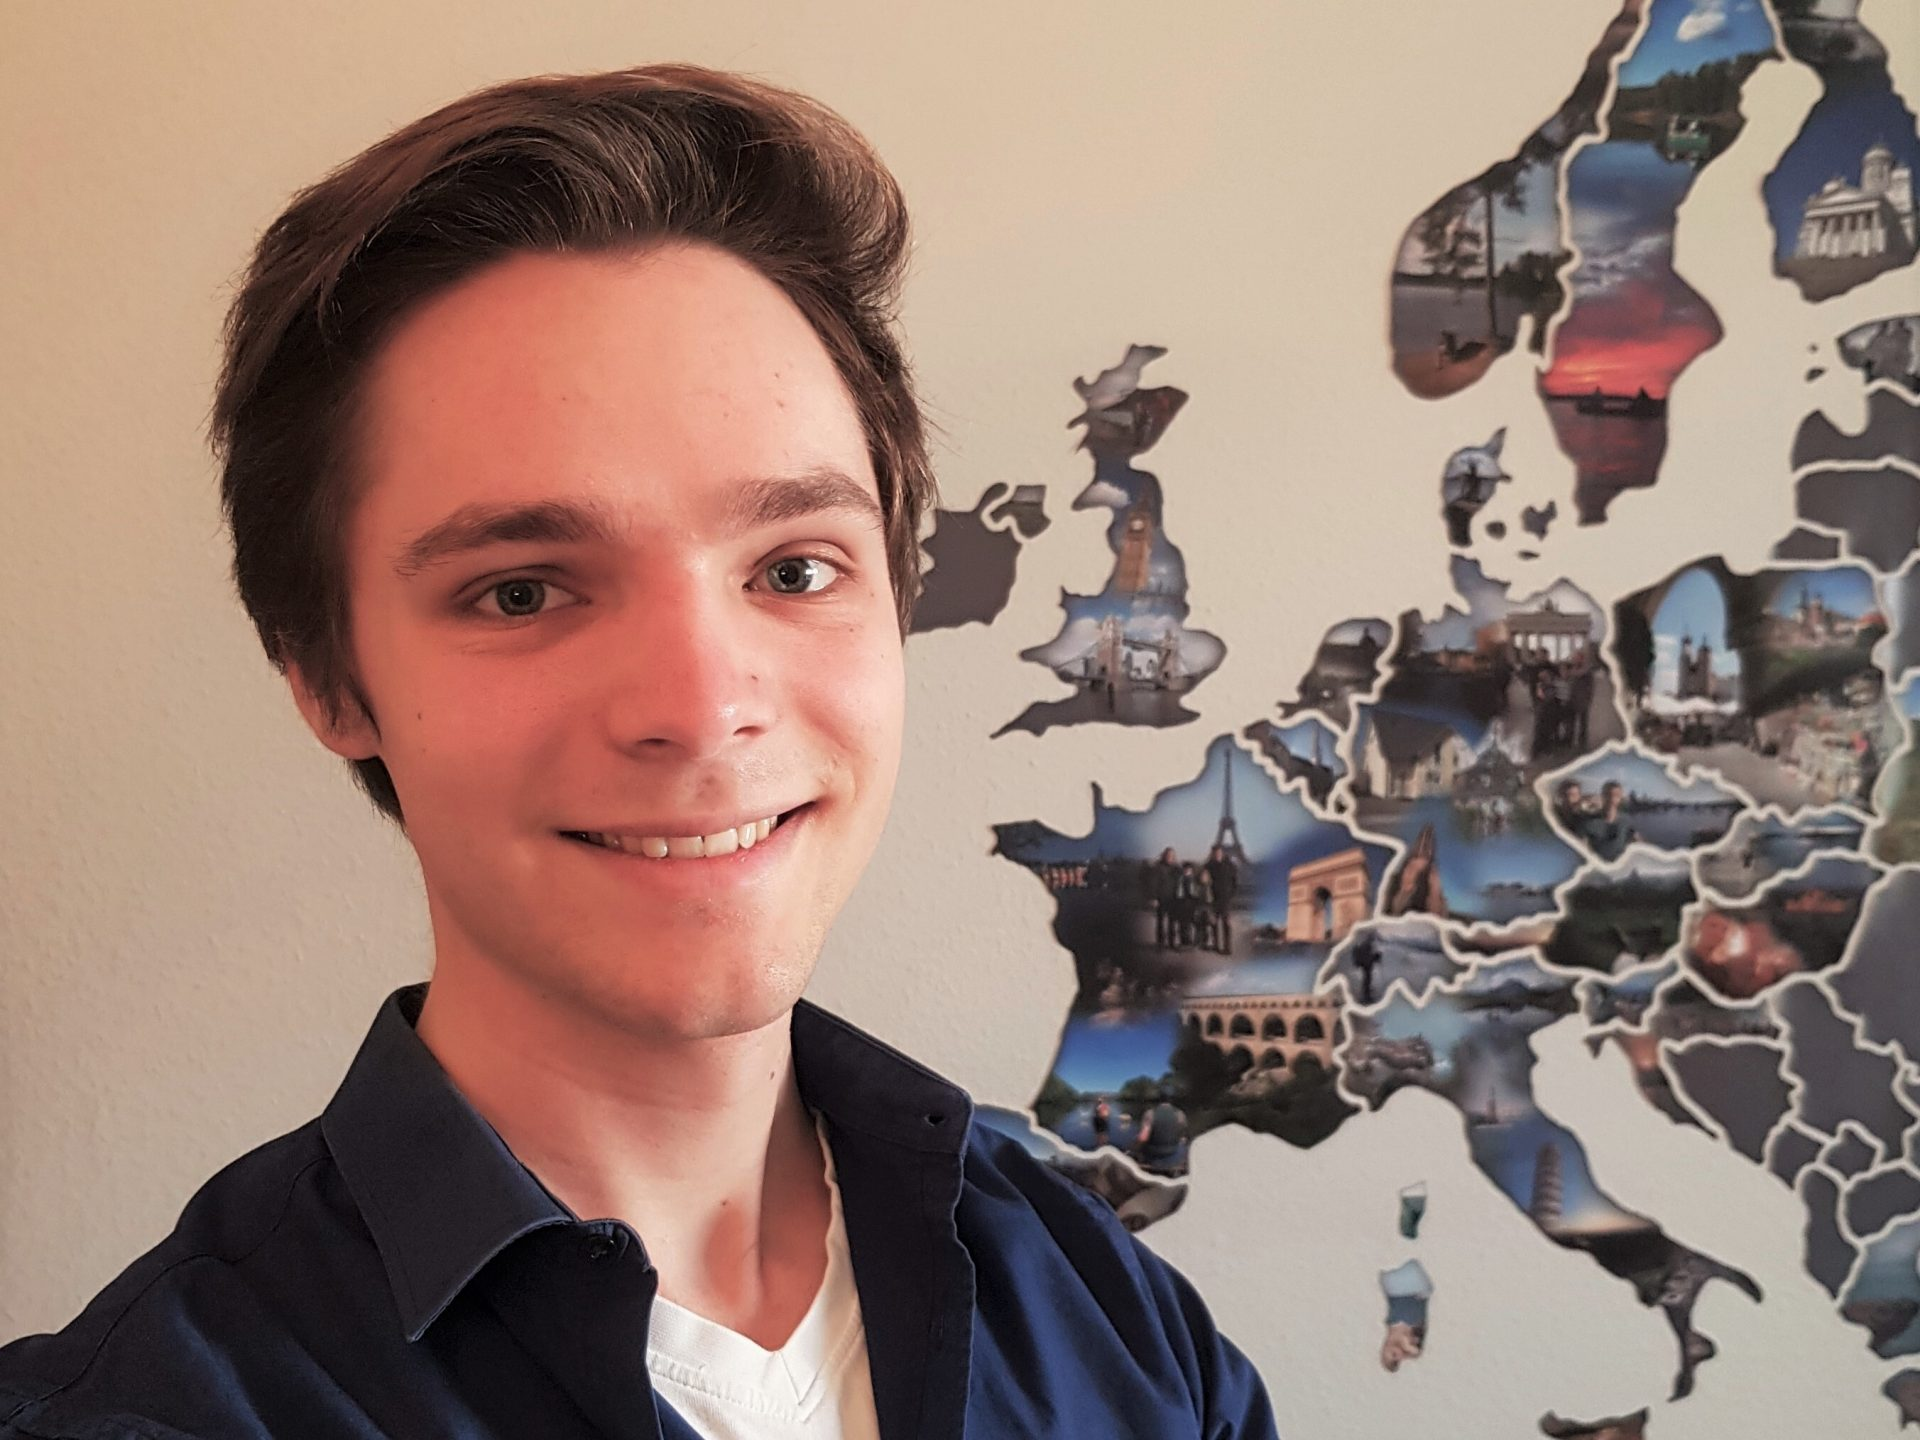 Jakob Schindel